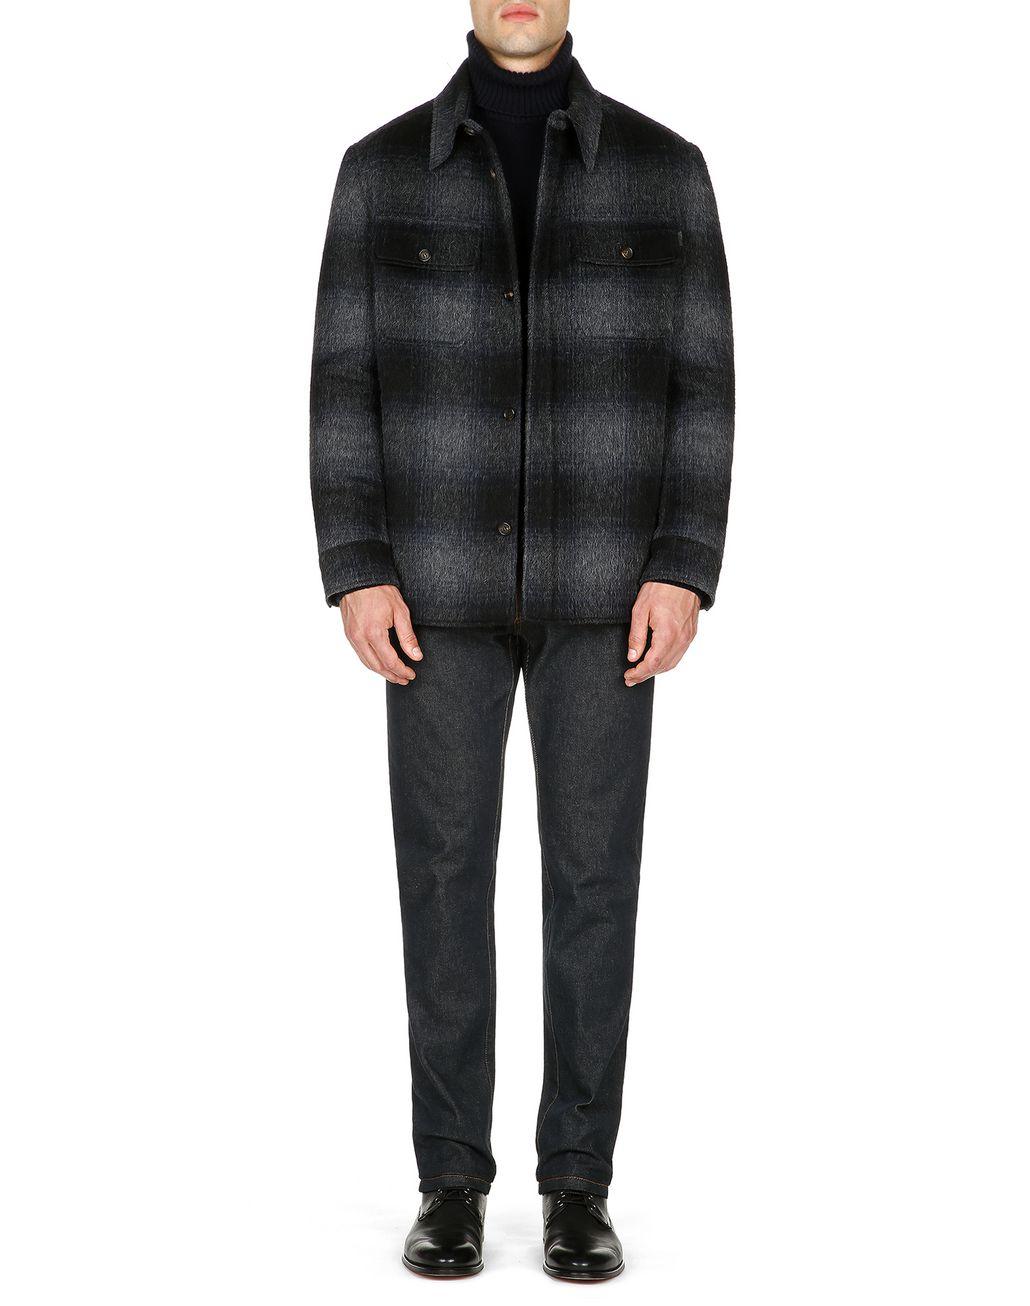 BRIONI Канадская куртка антрацитового цвета Верхняя одежда [*** pickupInStoreShippingNotGuaranteed_info ***] r